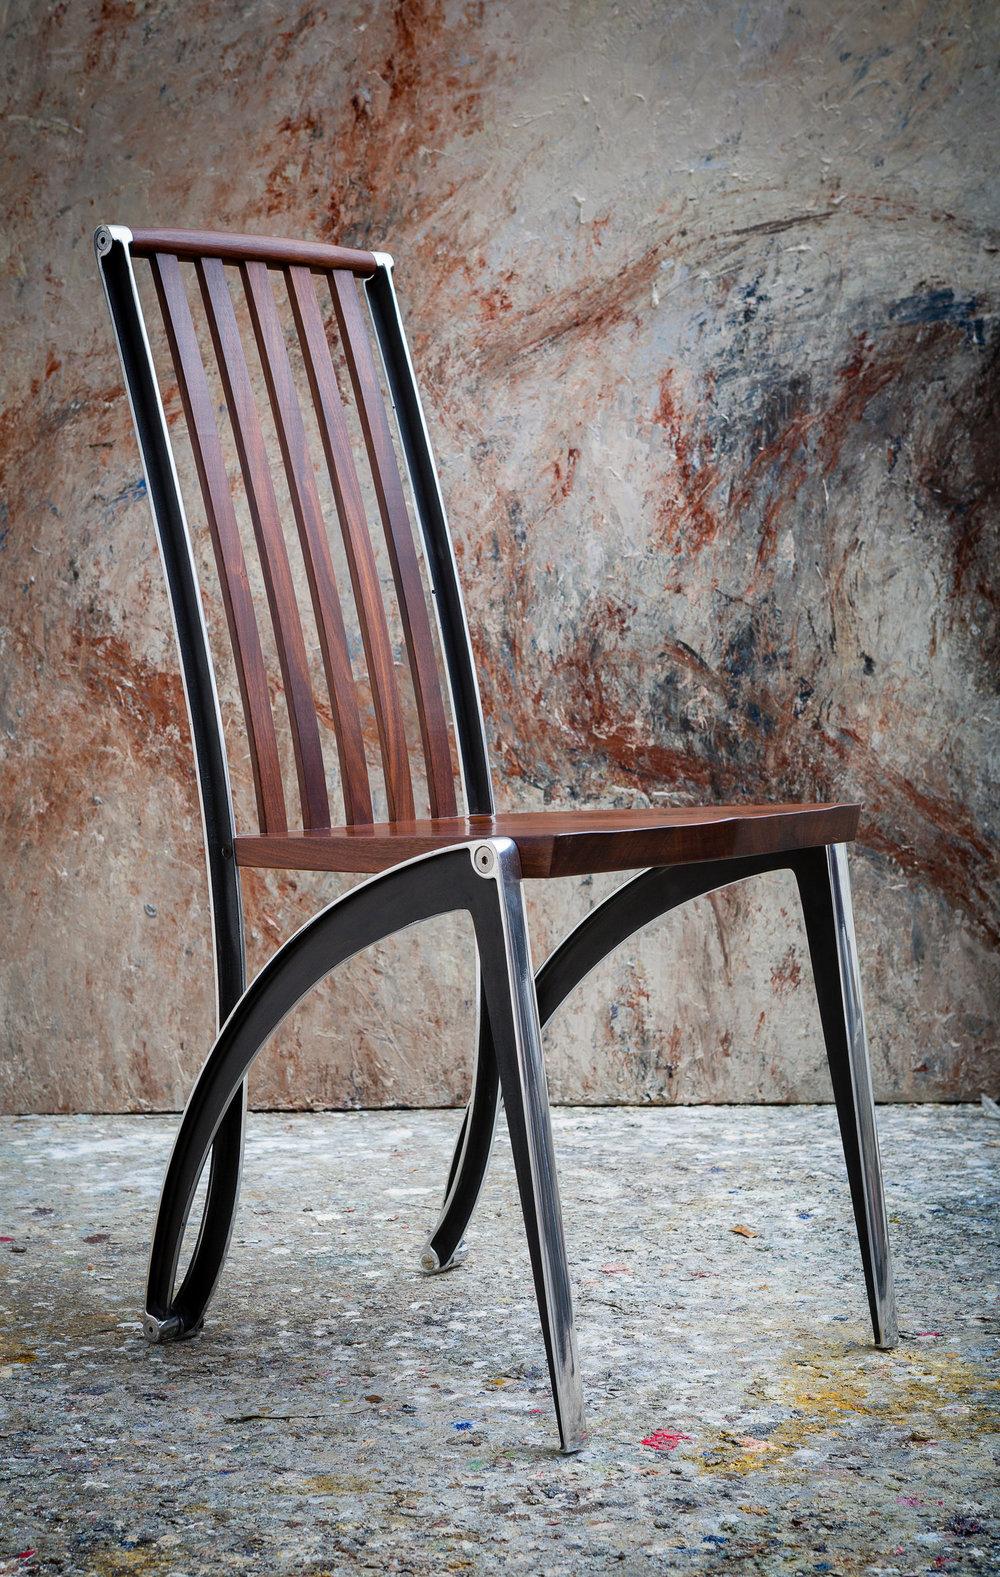 Mantide Chair_T1_3509.jpg